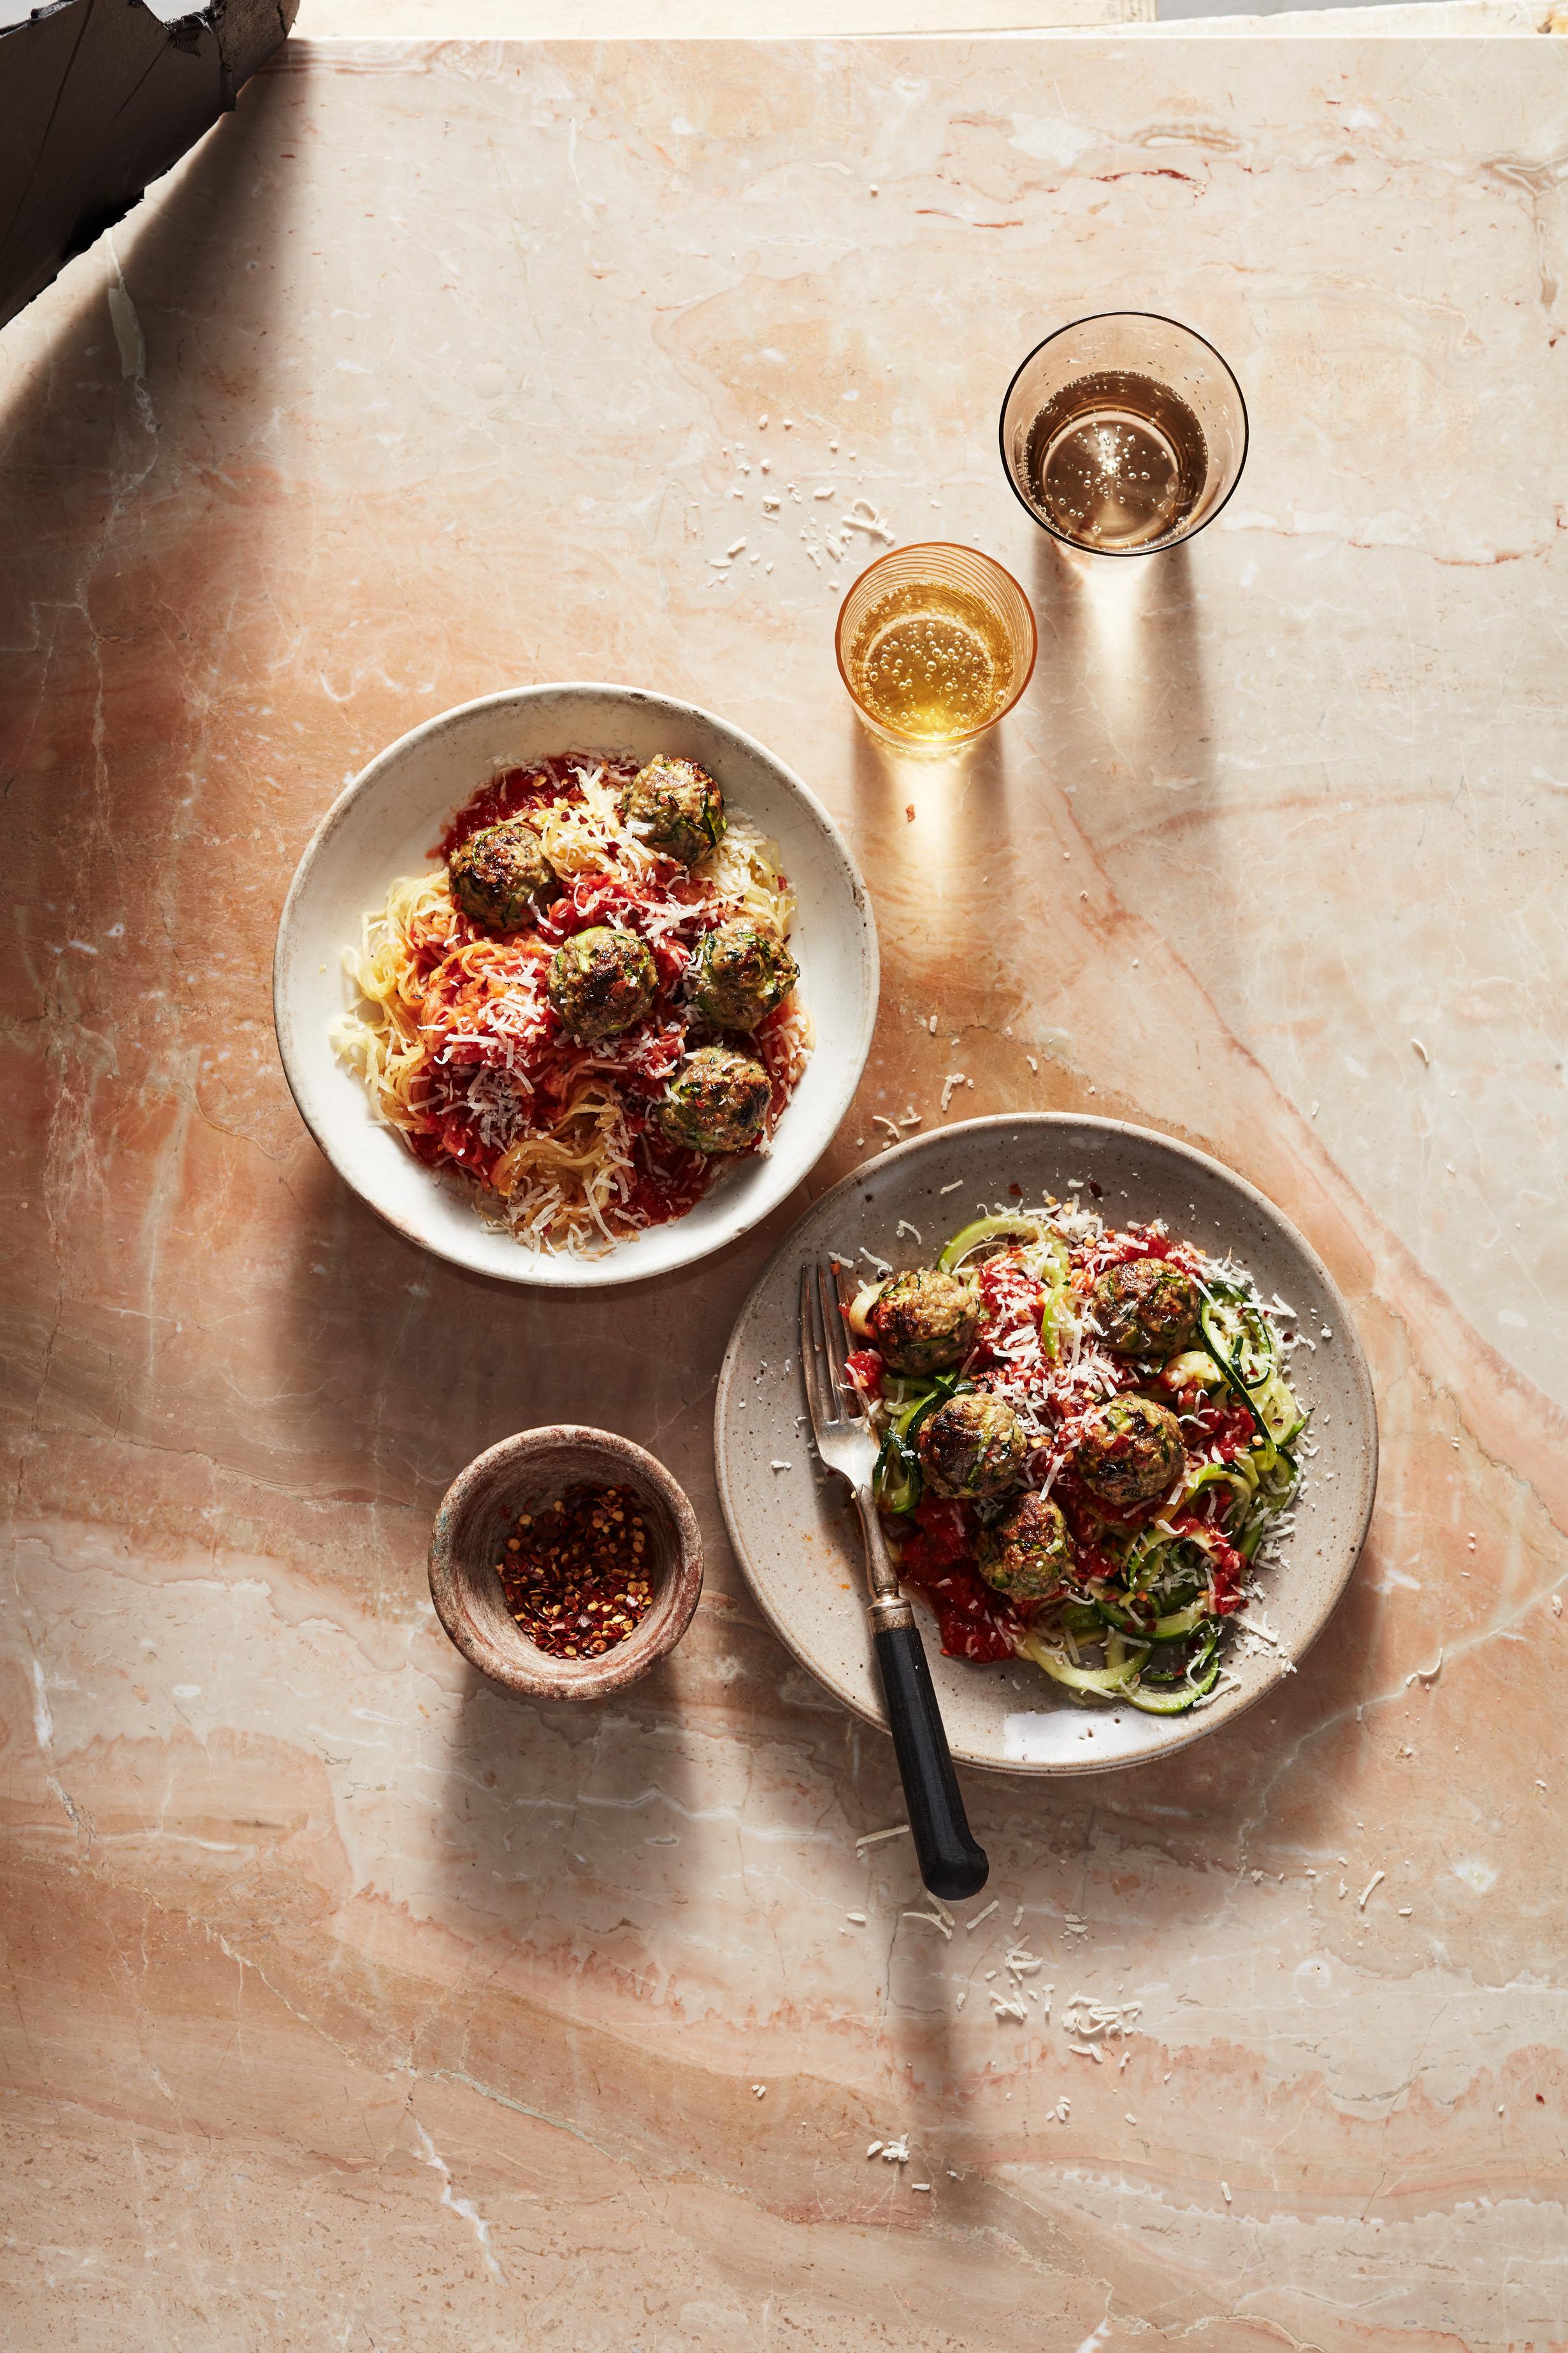 bowls of spaghetti squash and zucchini noodles with zucchini meatballs